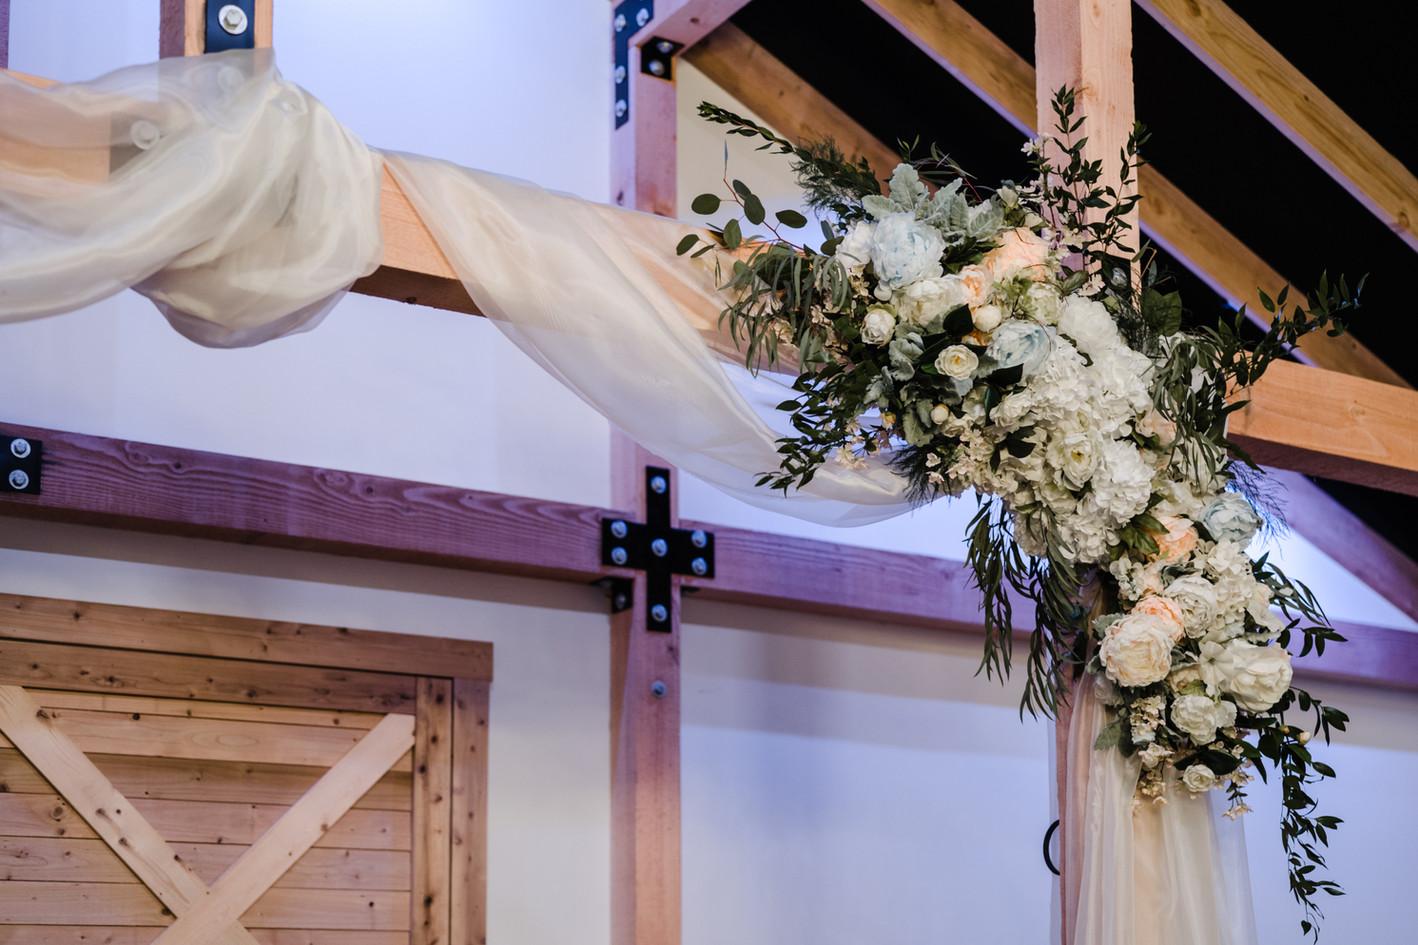 Images by Sasha Reiko | www.sashareiko.com